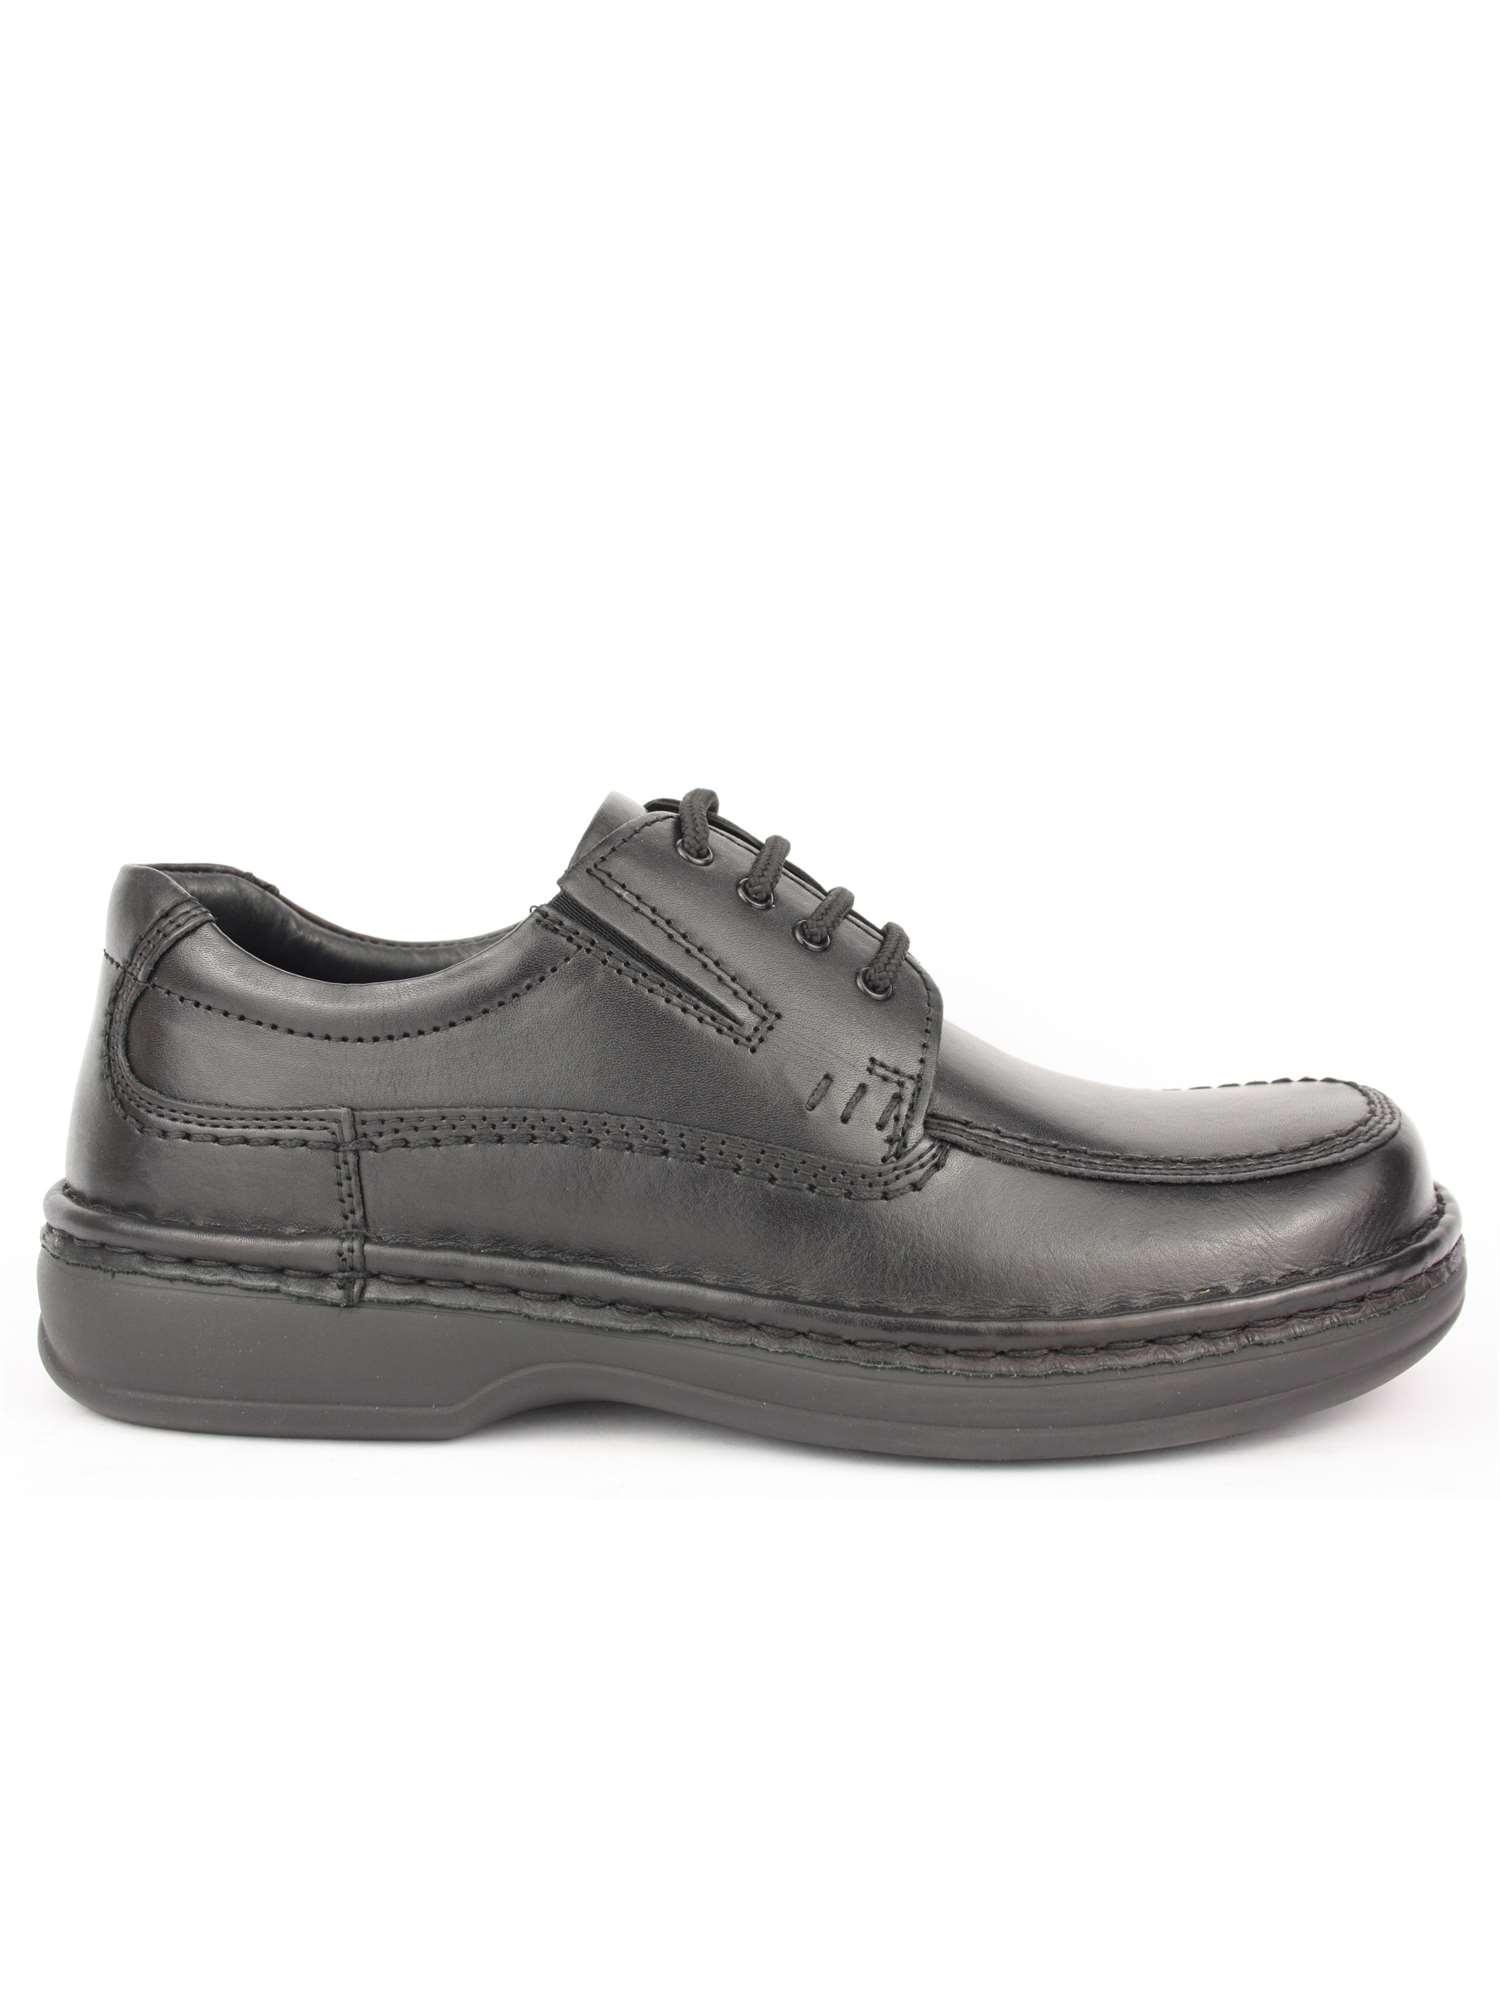 the latest b9a1b 99ffb Ara Shoes Lacci Nero | Lacci Uomo Pelle | Tania Calzature Bari